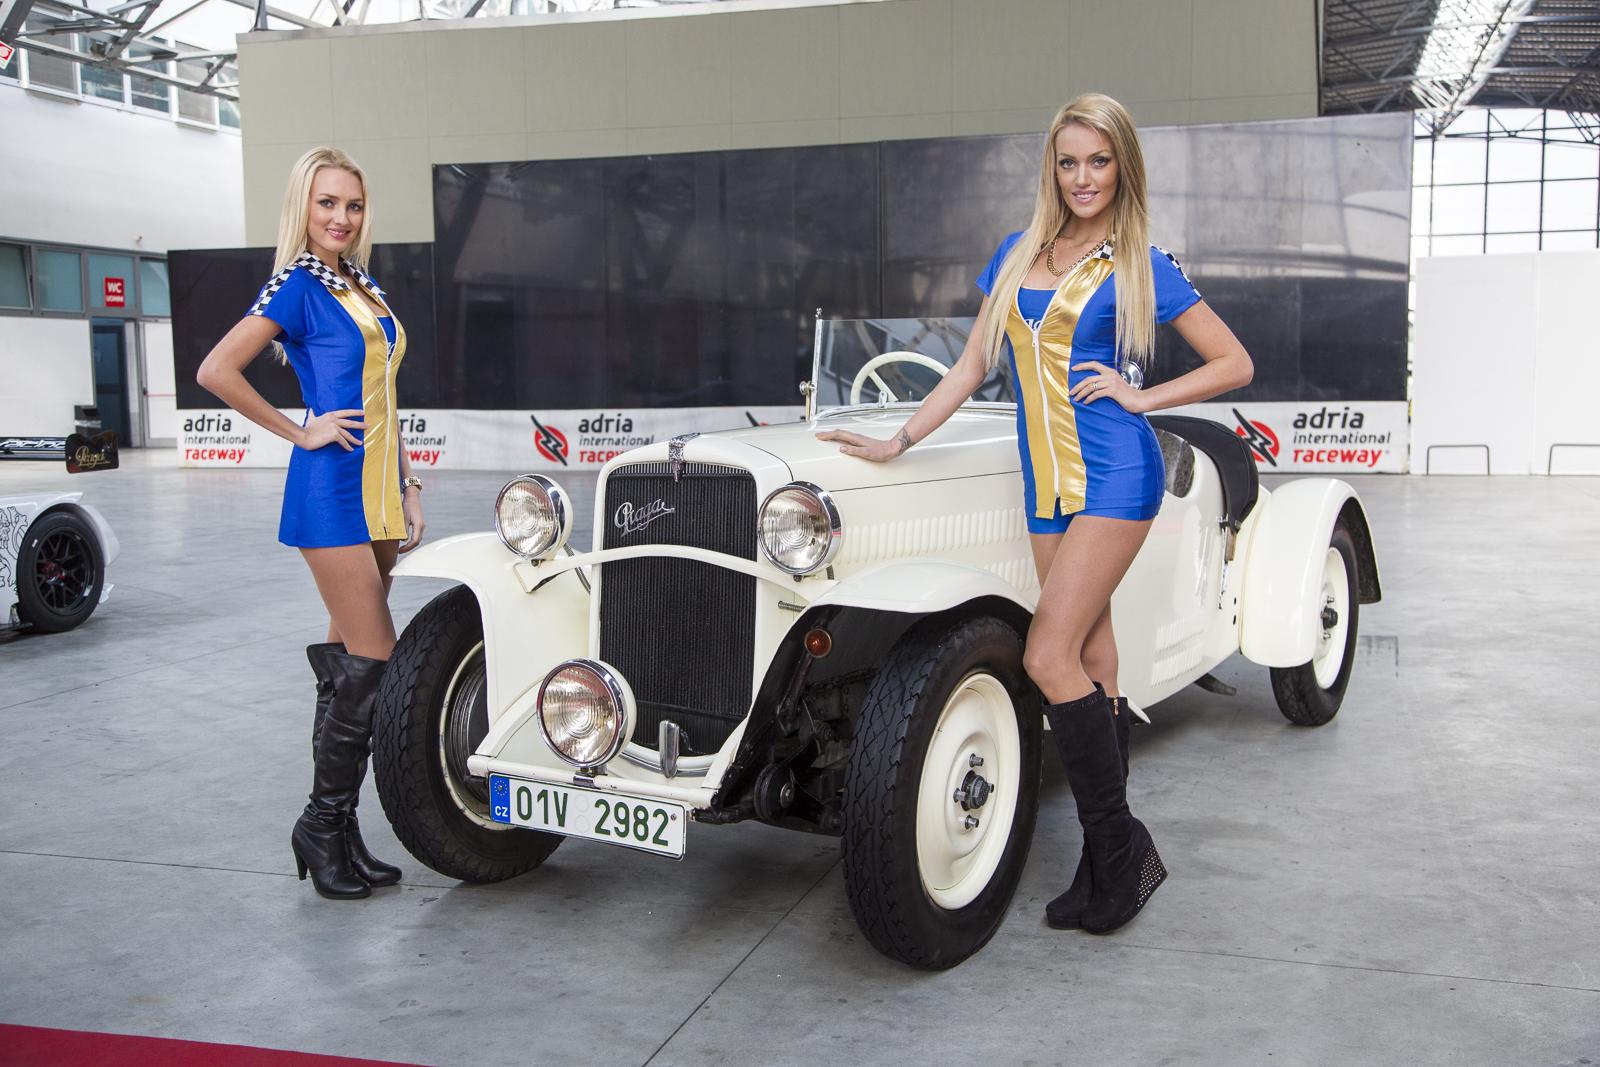 Italy has Praga covered with Adria Raceway dealer